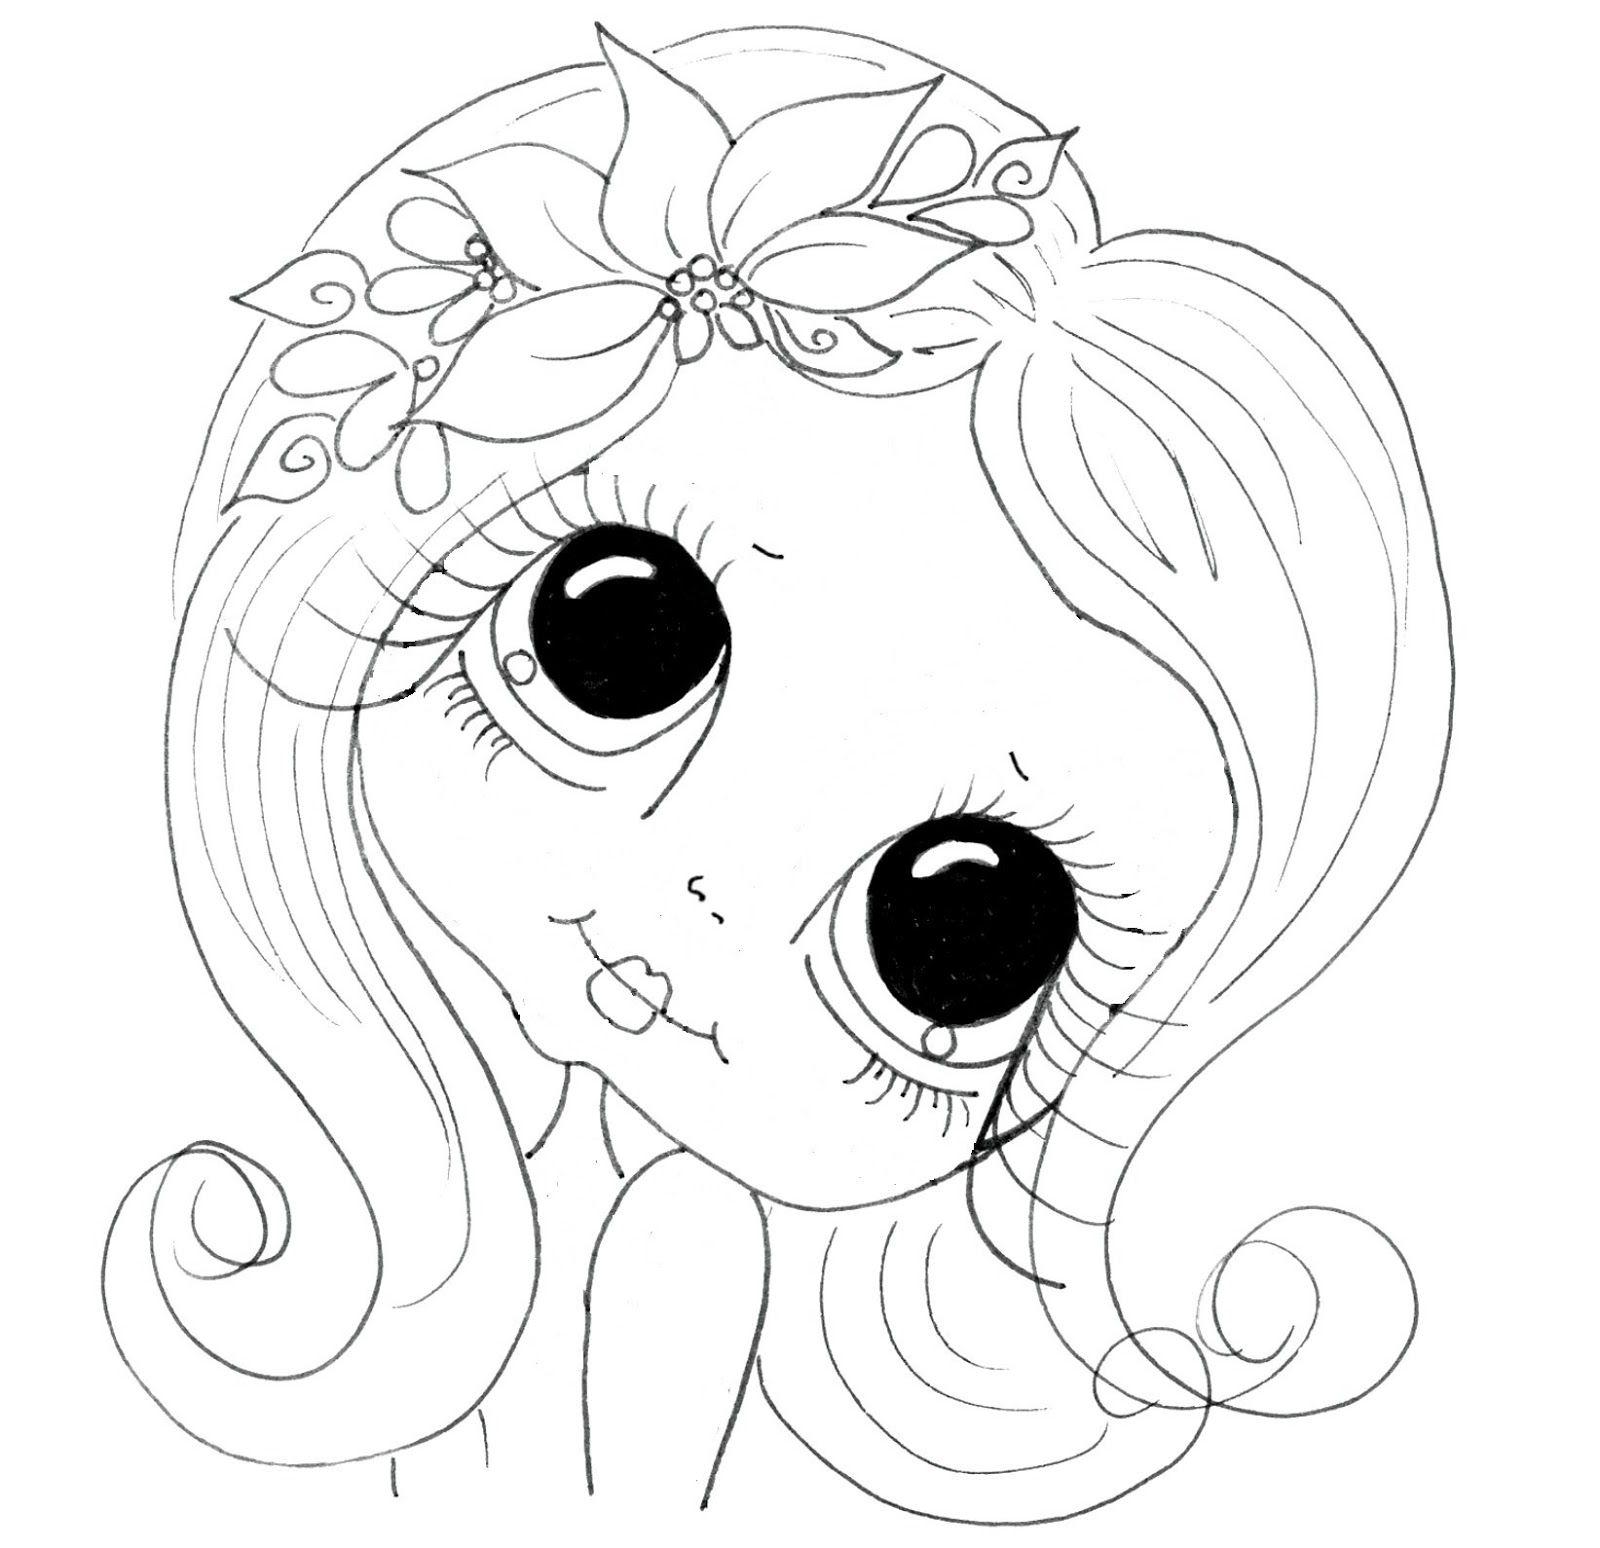 Pin de Zandra en ❣️Coloring Cuties❣   Pinterest   Colorear ...